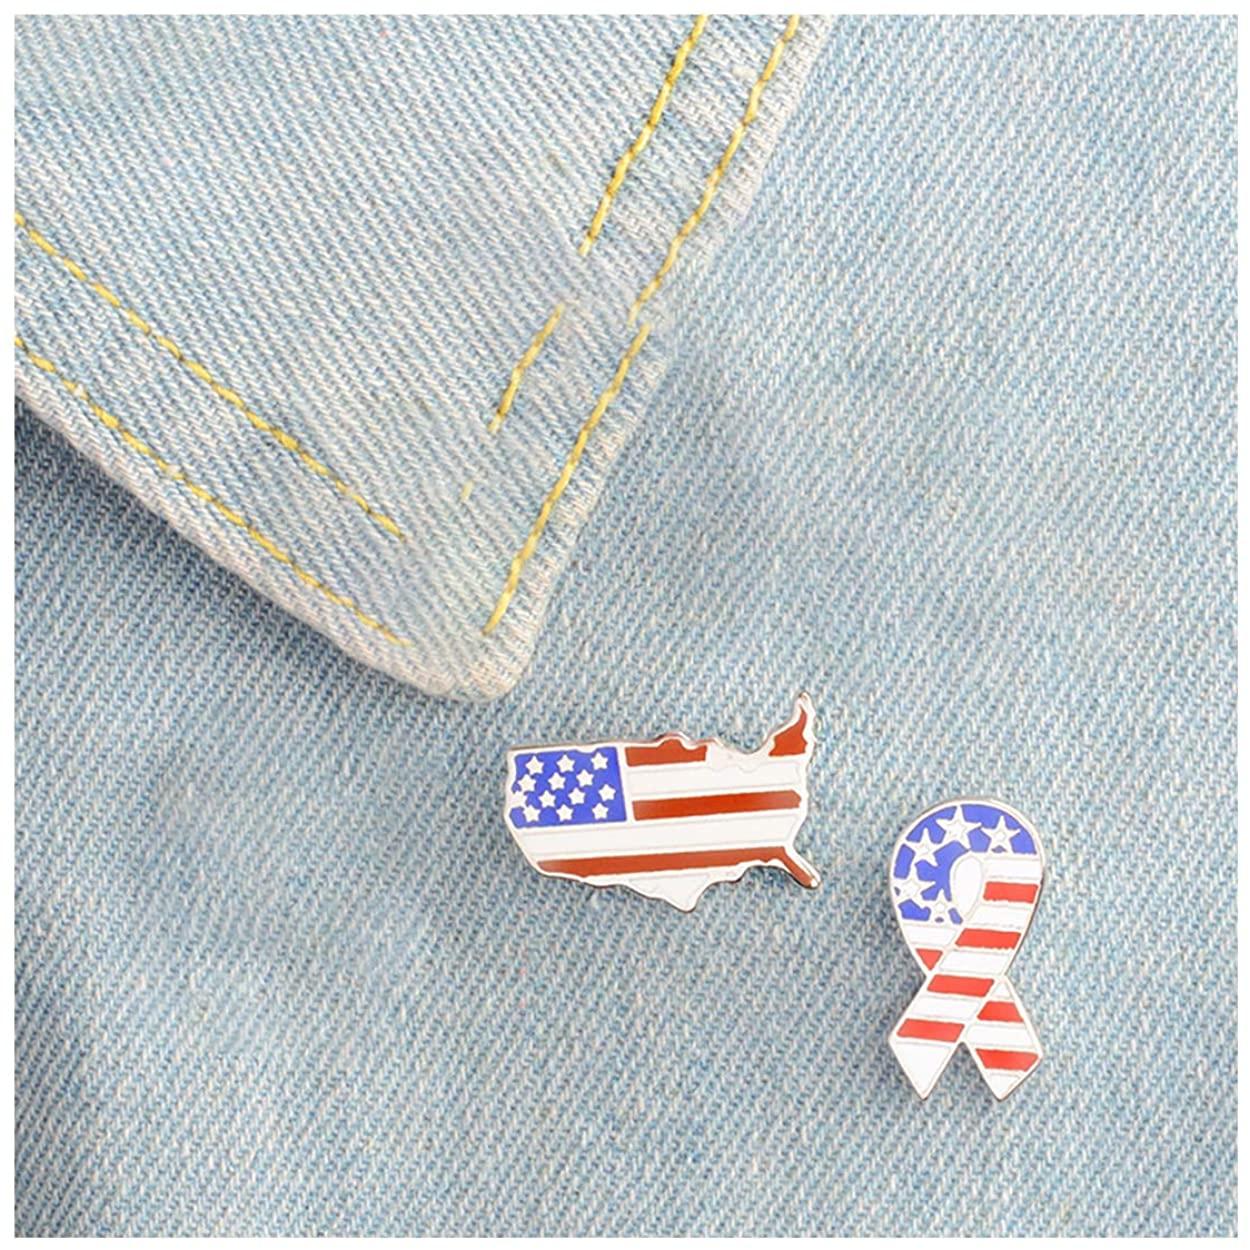 MIXIA 2pcs/Set National Flags Enamel Pin American USA Flag Brooch Pins Set Clothes Collar Pin Badge Jewelry Gifts